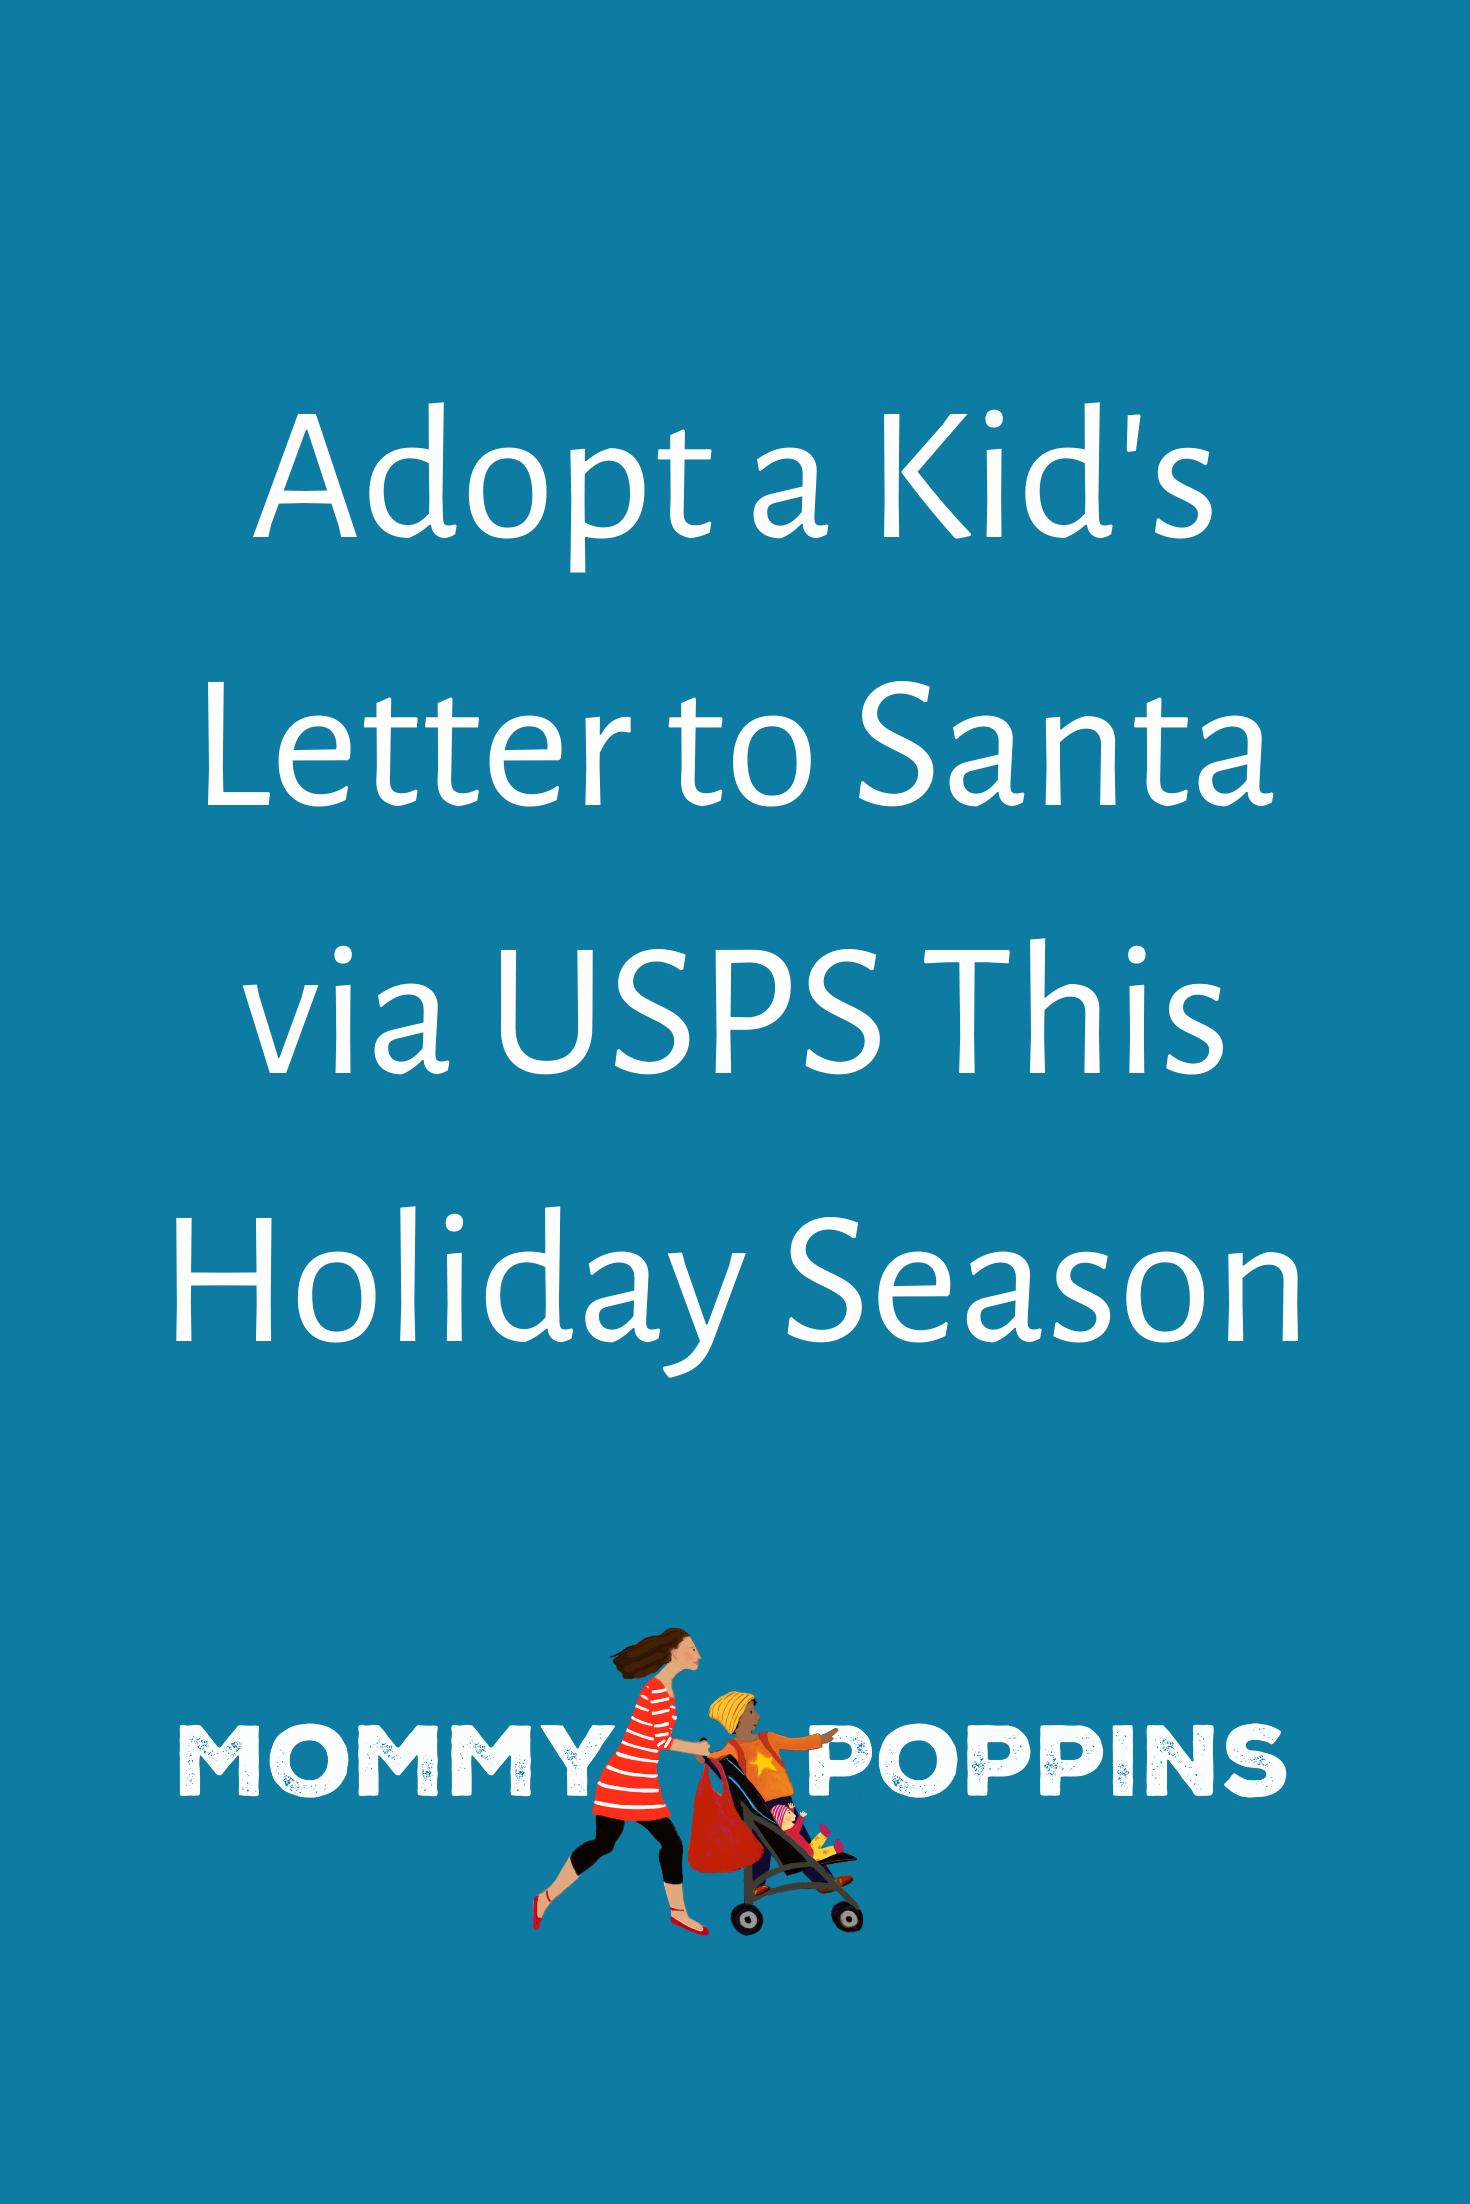 Adopt a Kid's Letter to Santa via USPS This Holiday Season